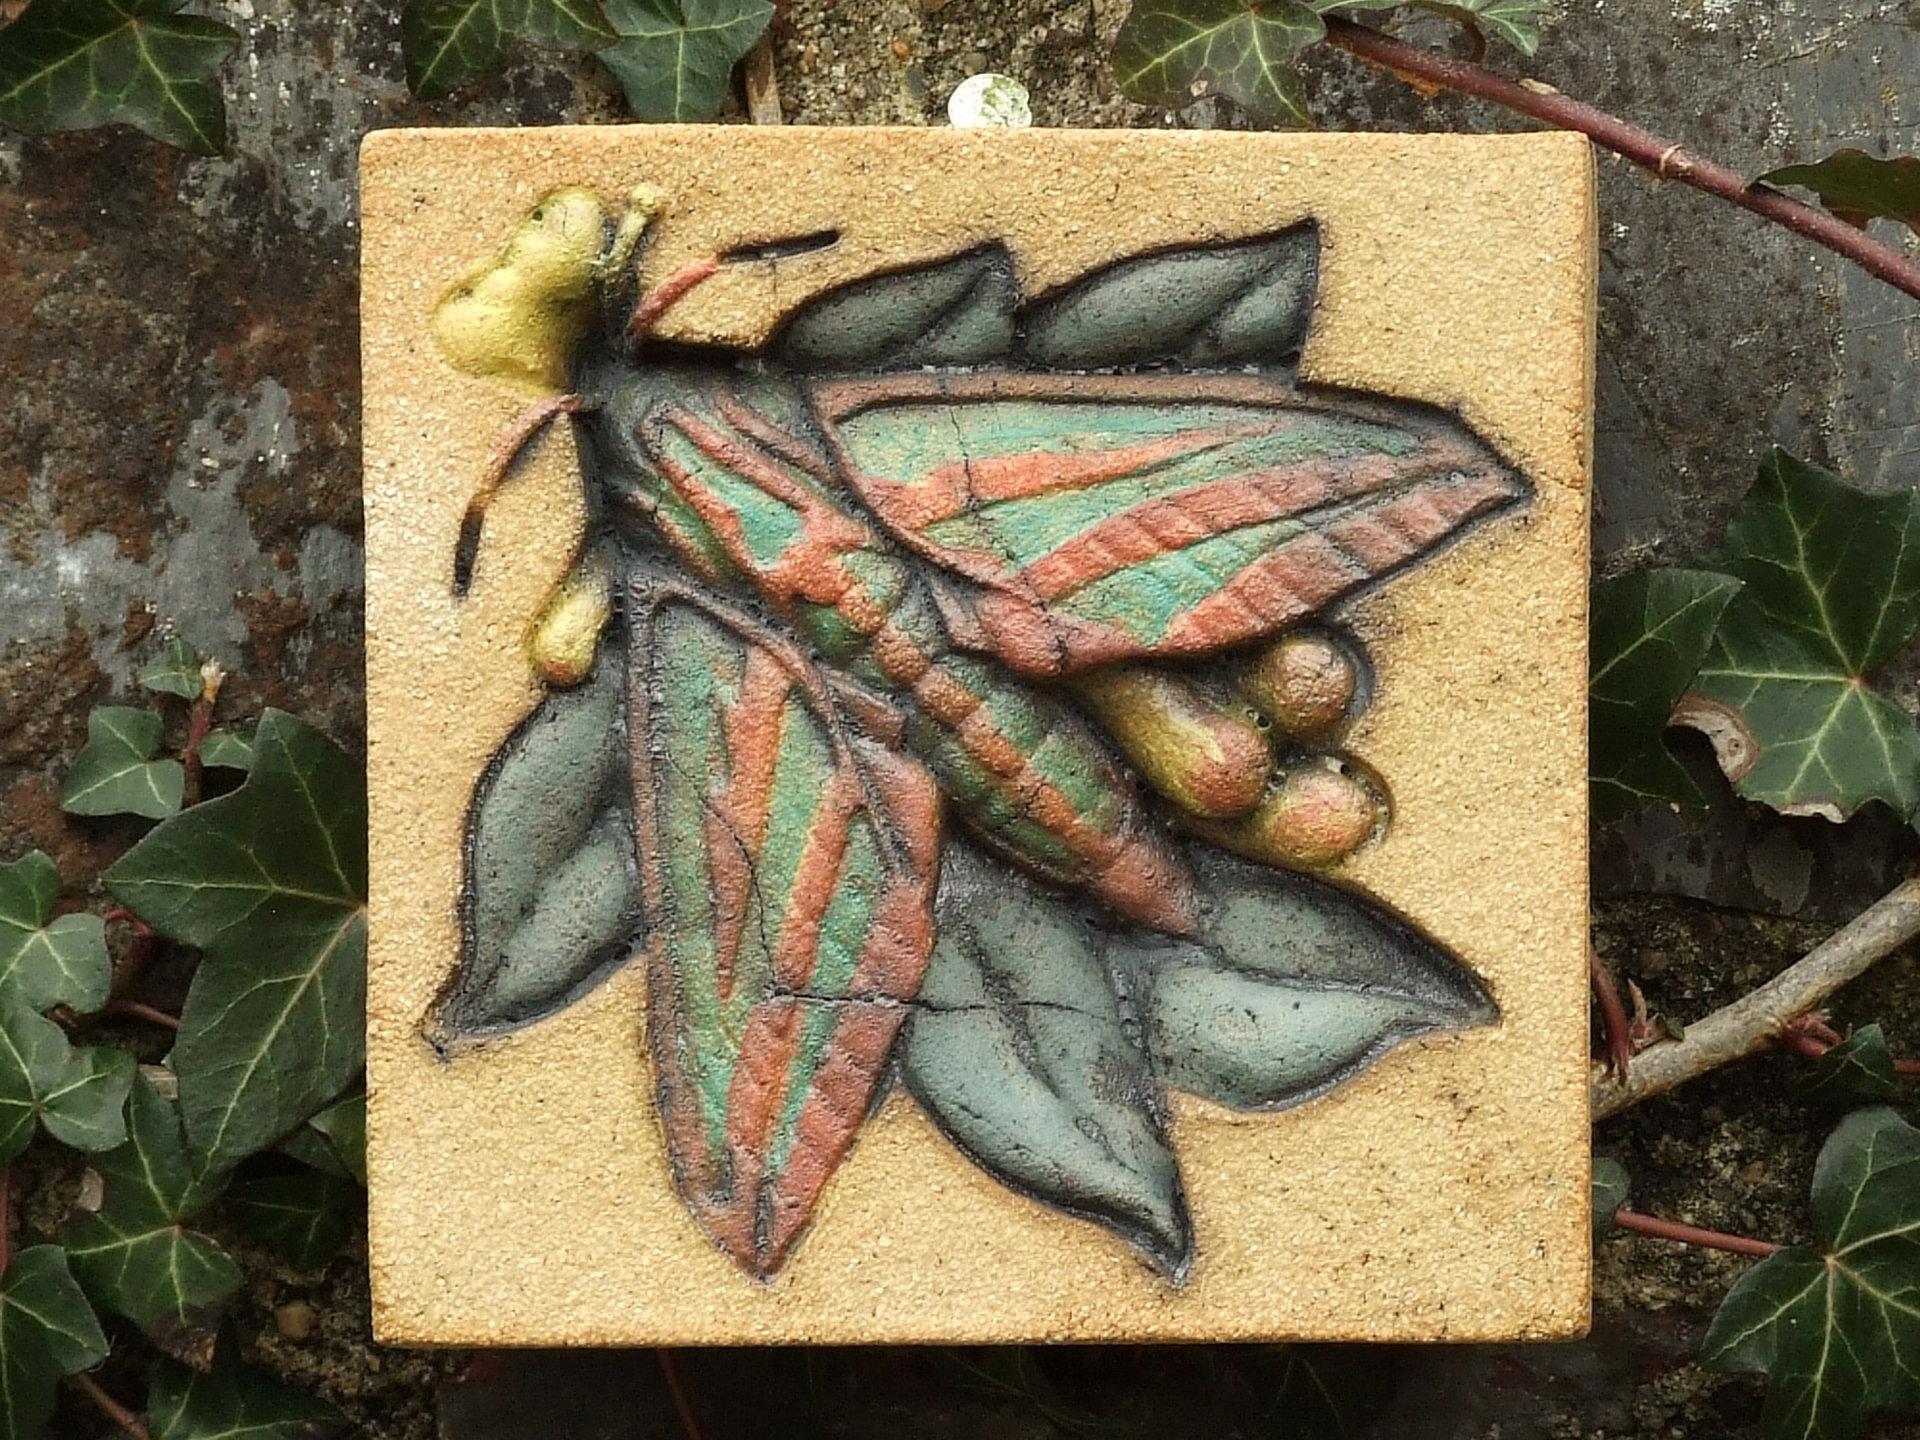 elephant hawk moth, wild honeysuckle, Ama Menec sculpture